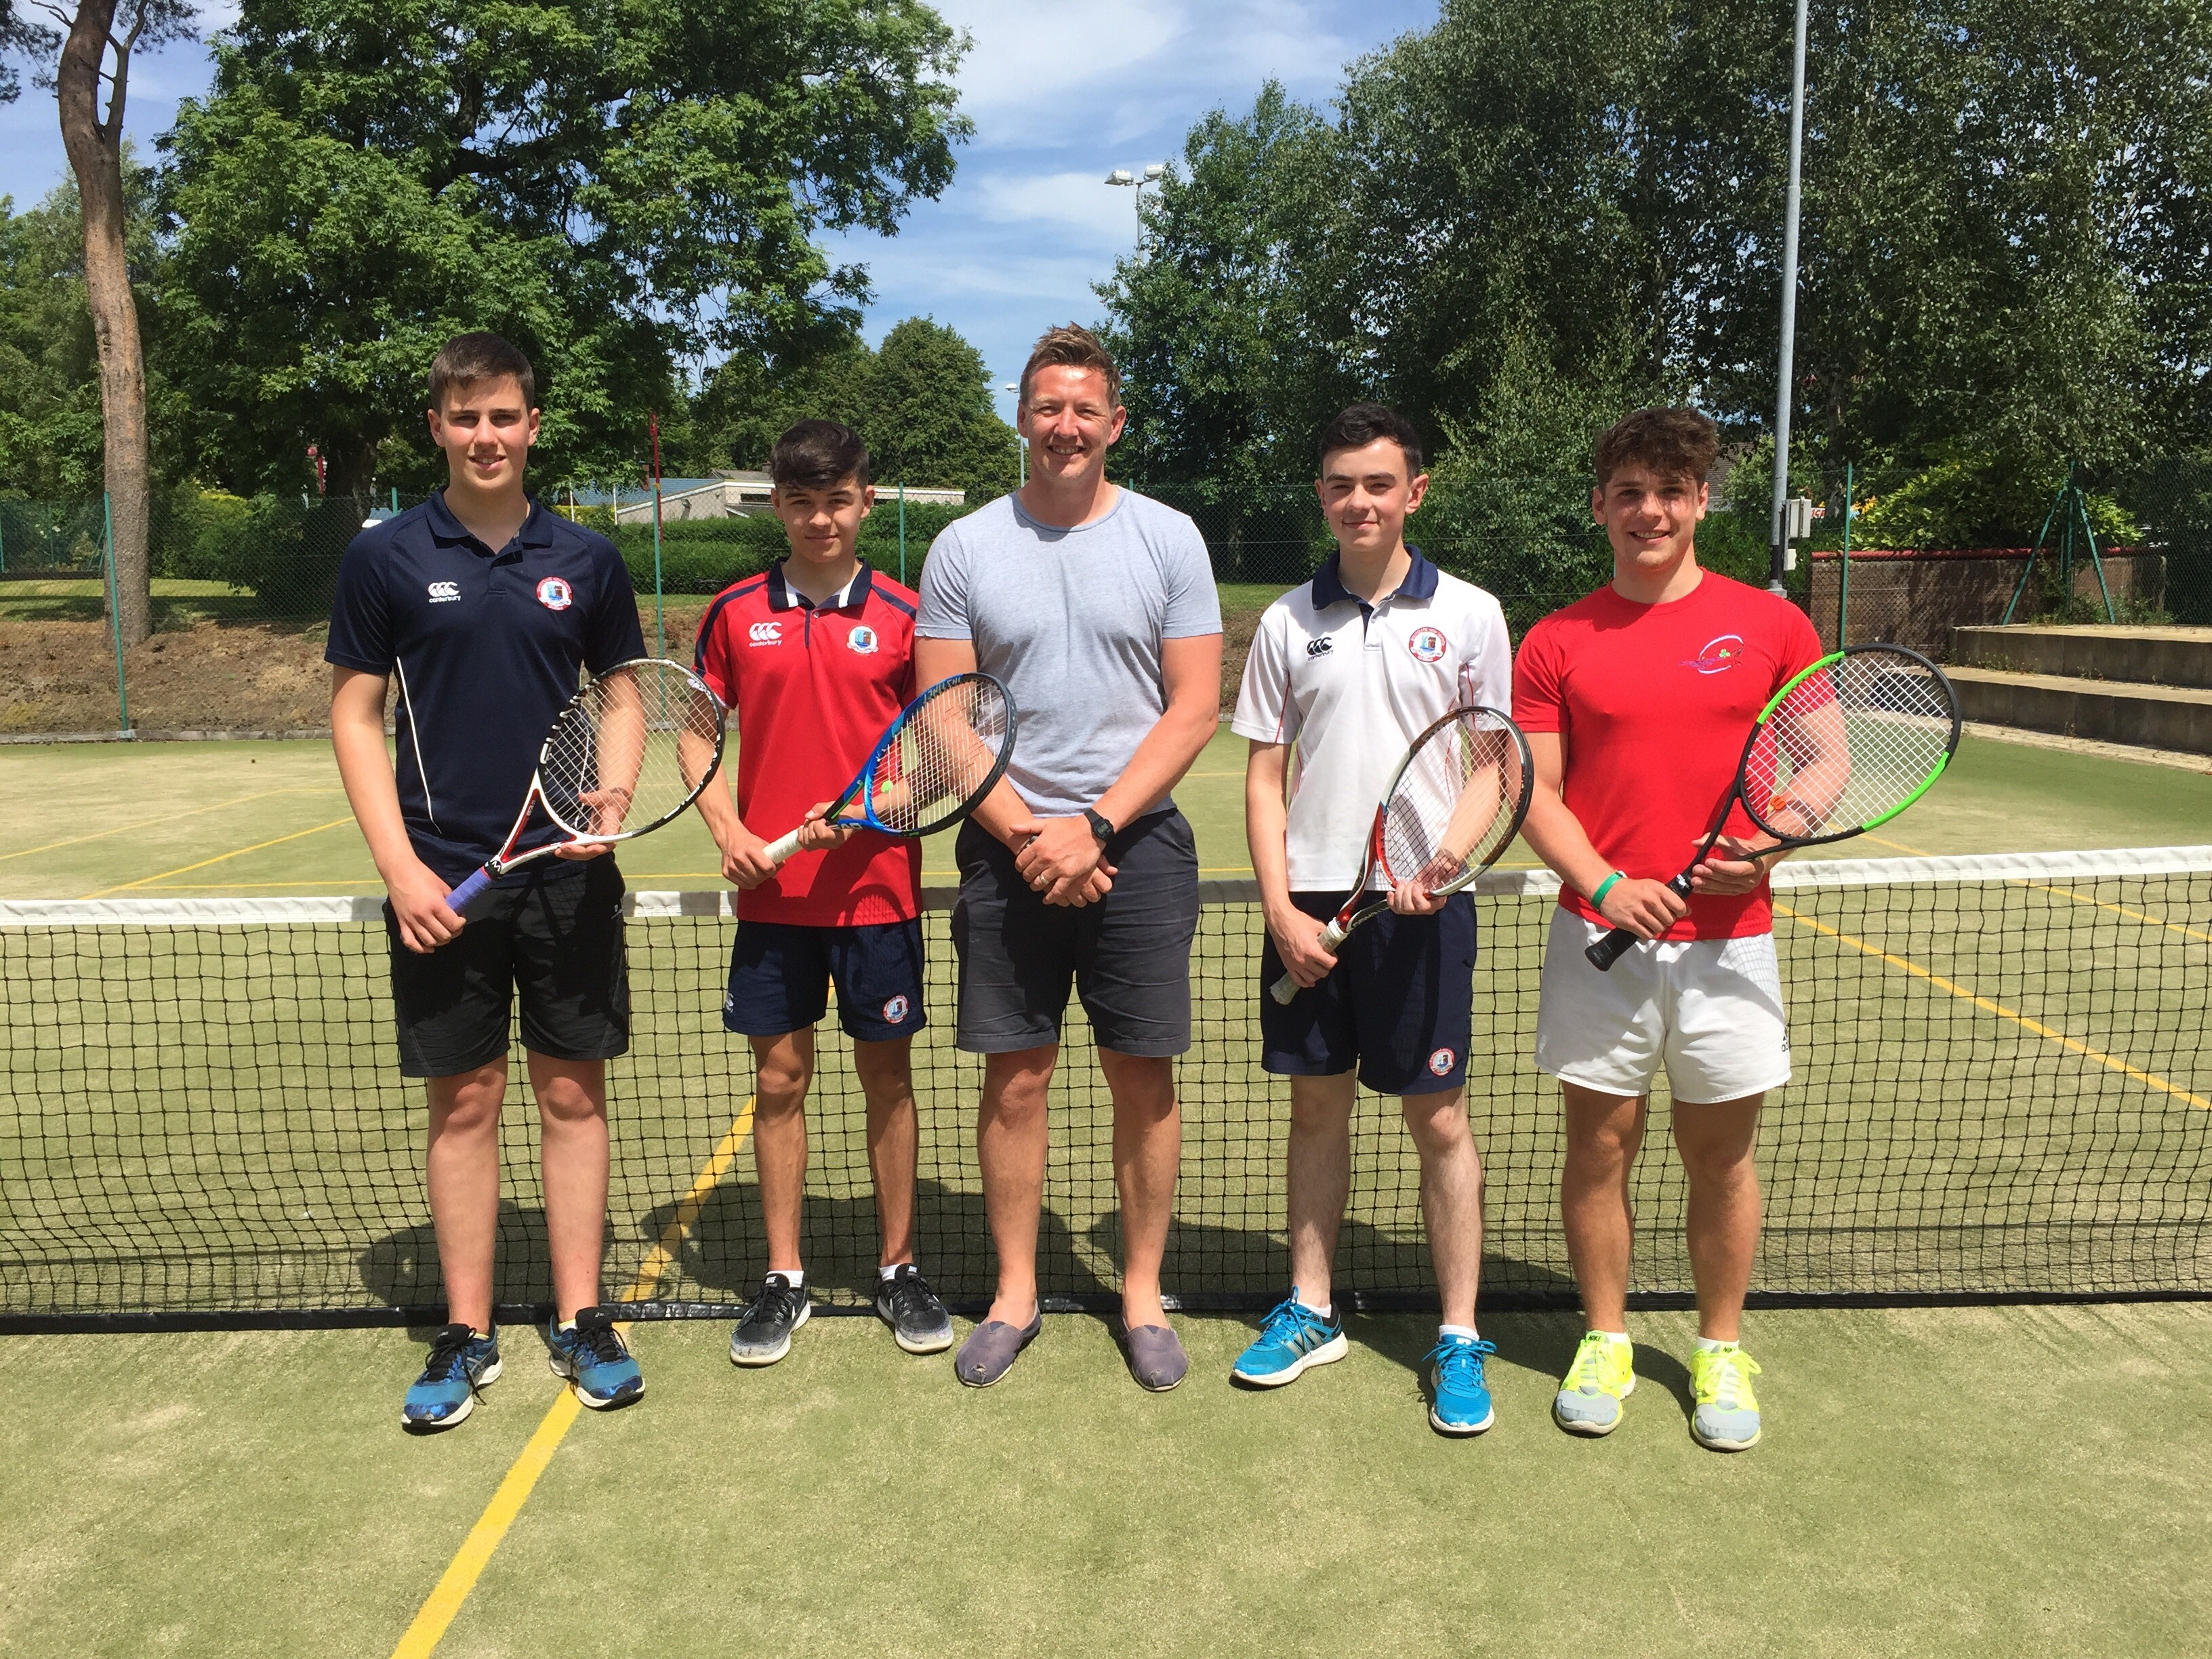 Ballyclare High School Tennis